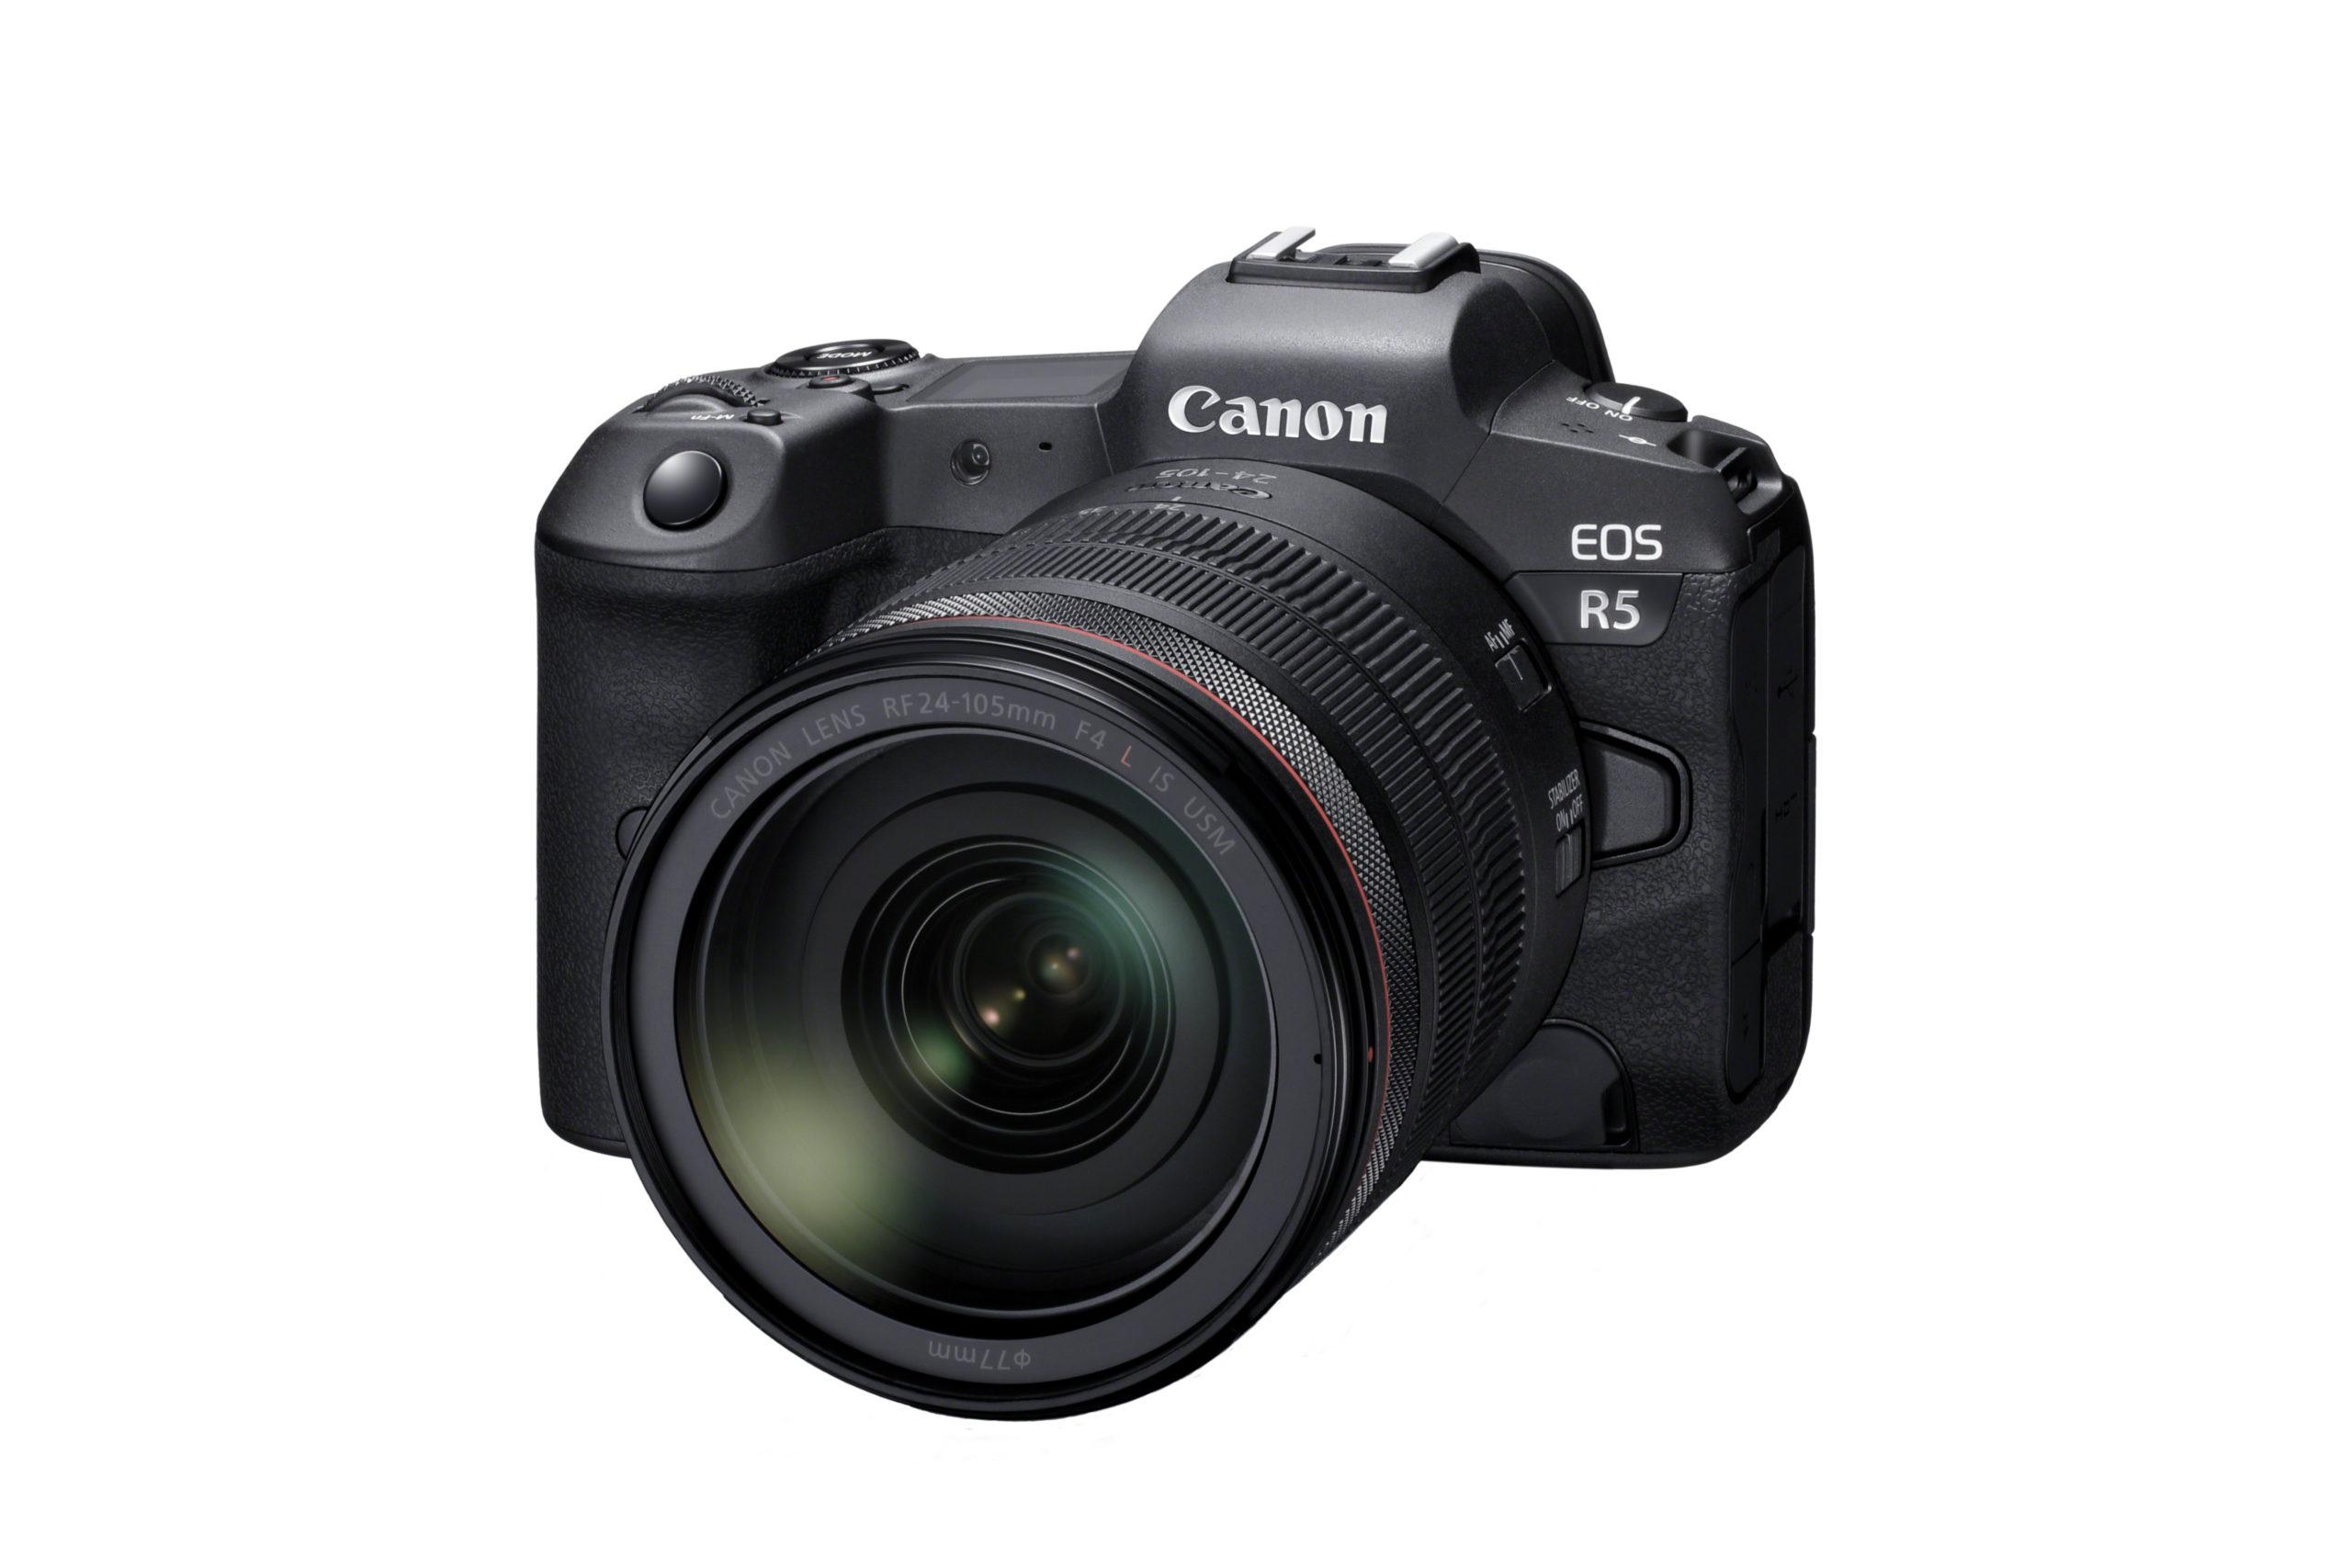 Canon announces development of the 8K video-capable EOS R5